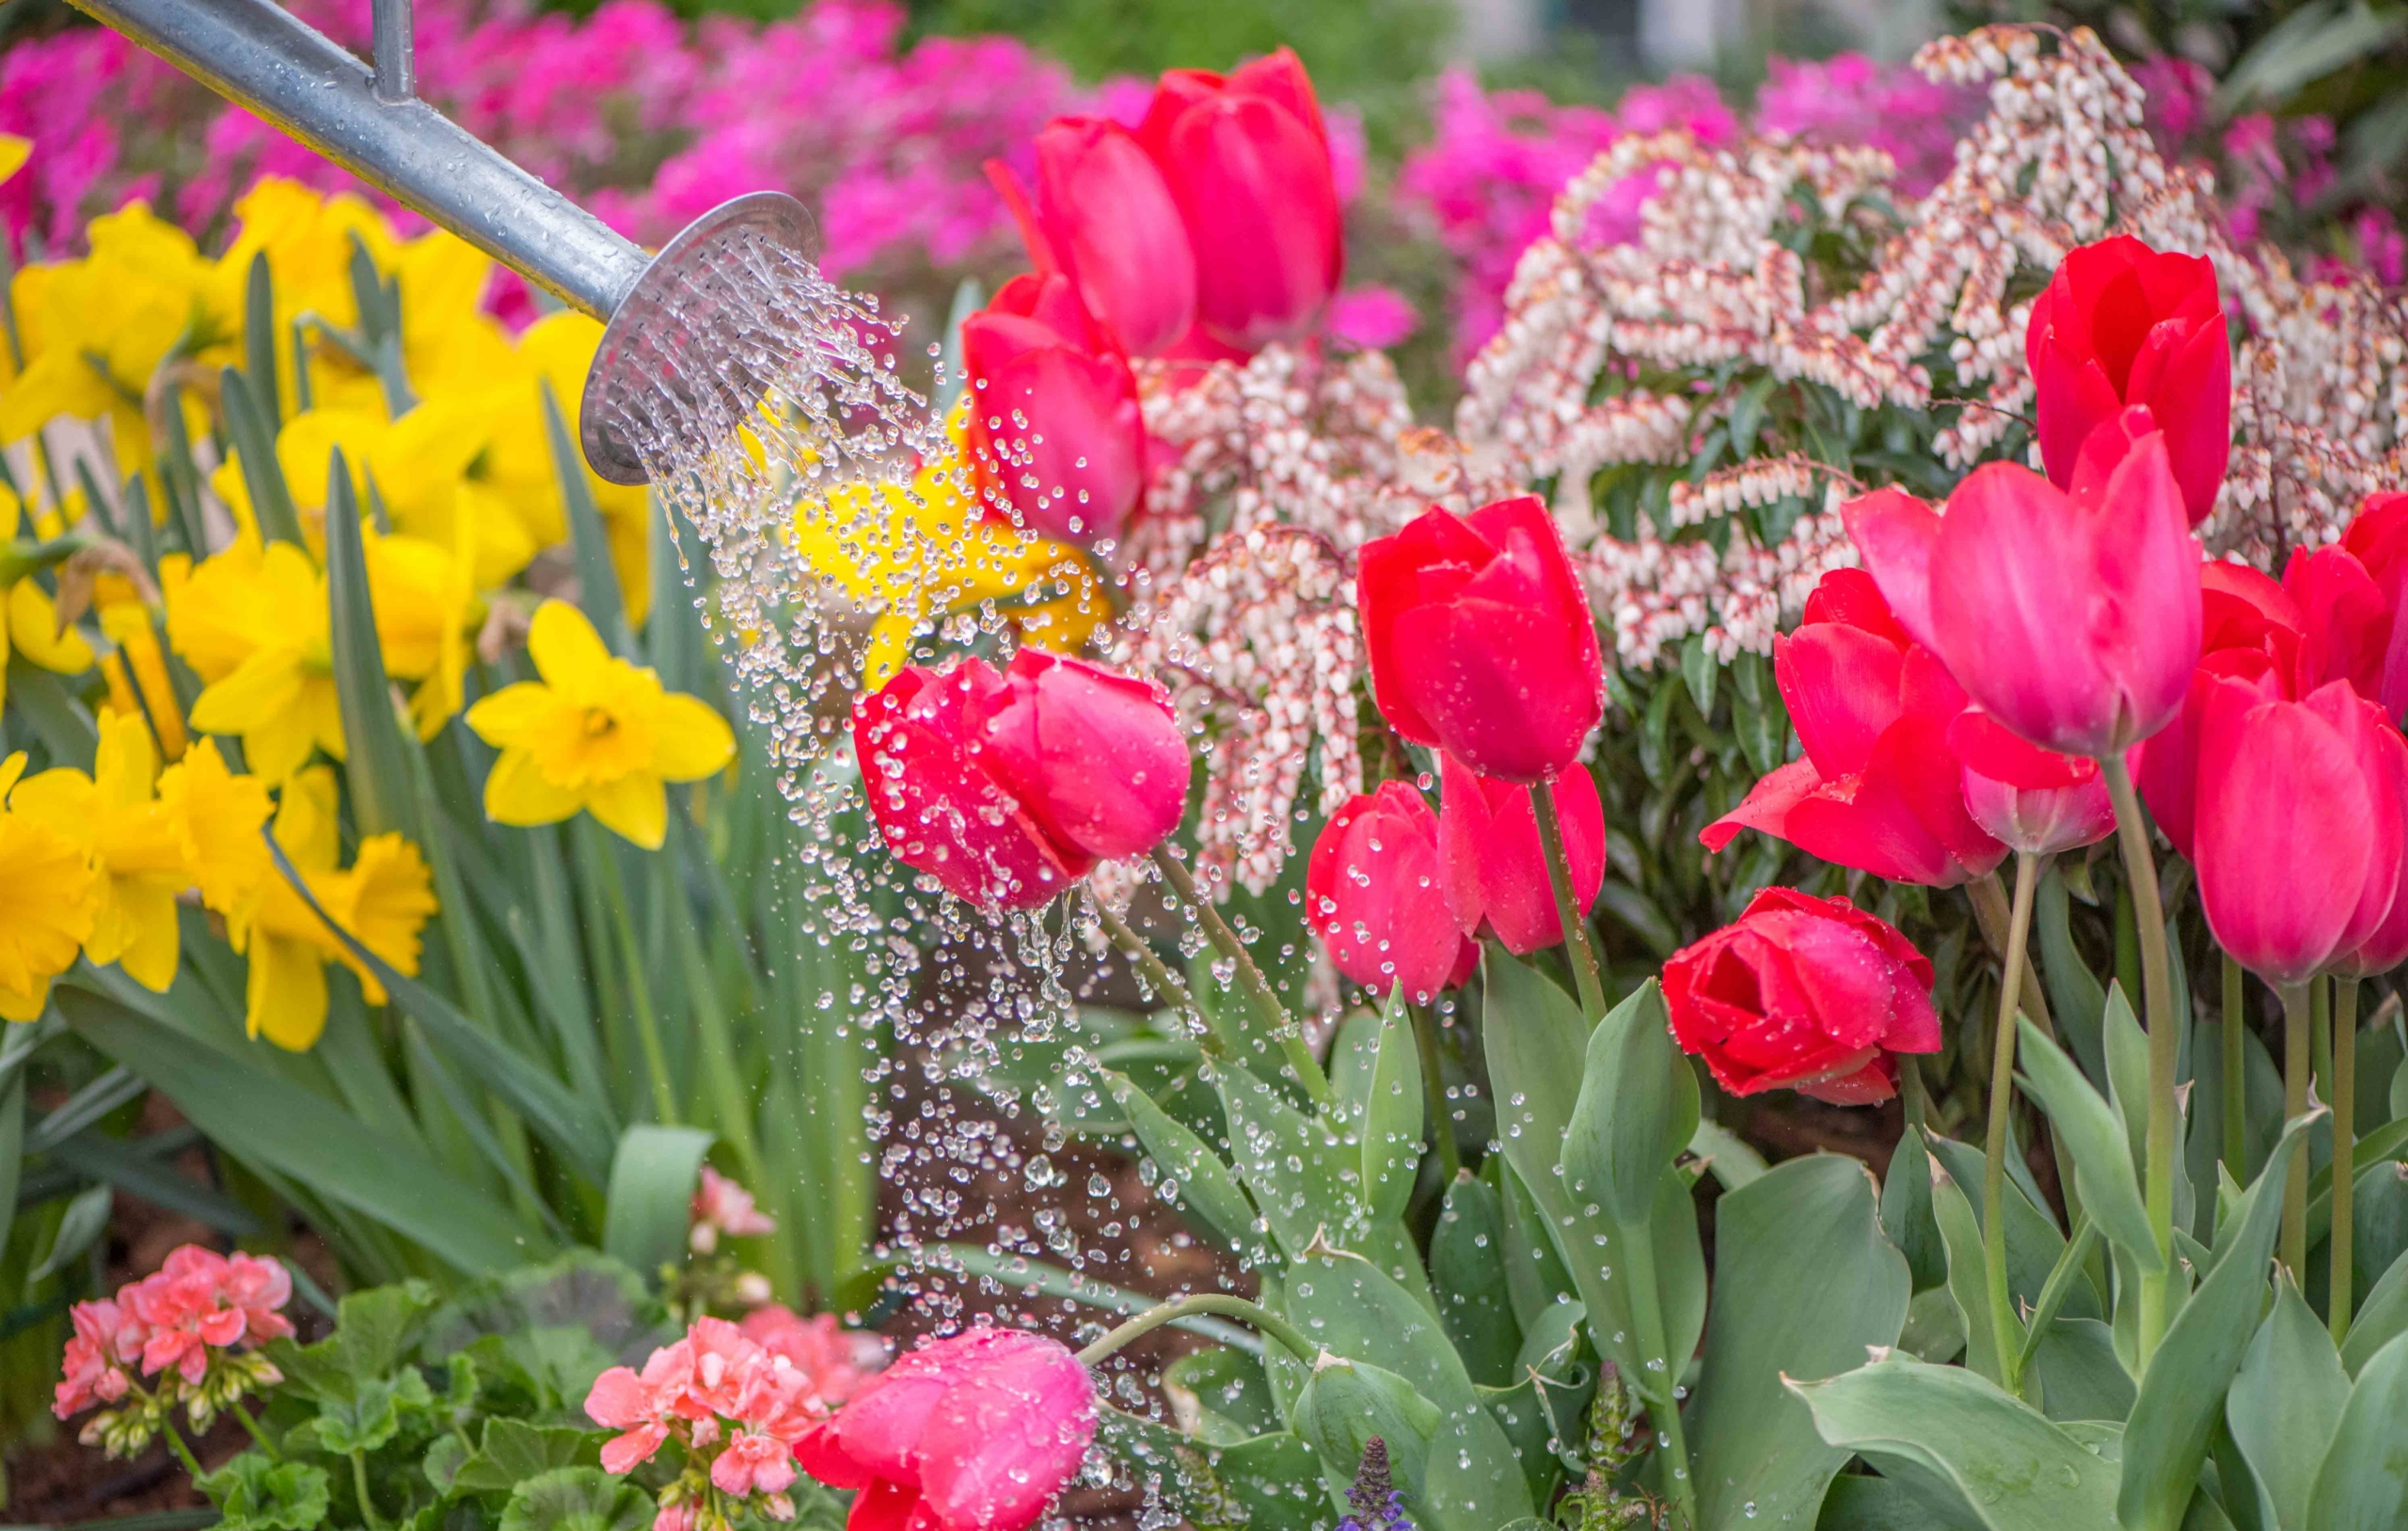 Watering Tulips